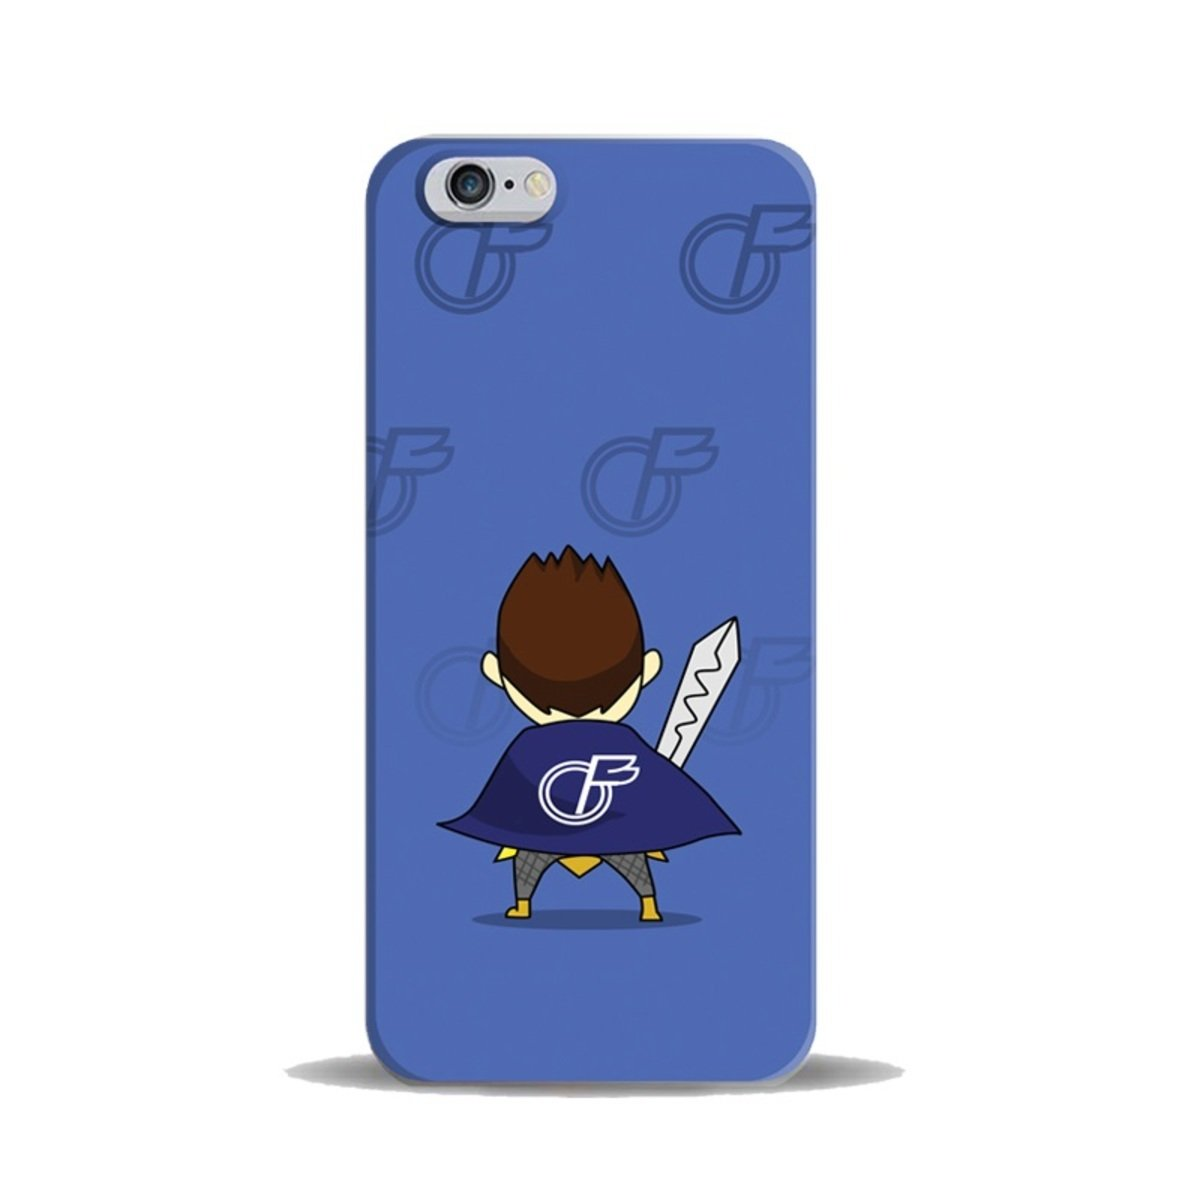 "iPhase - iPhone 6 (4.7"") 手機膠殼電話保護套 4.7寸 (Fasia) (另有適合iPhone 6 Plus 5.5寸型號)"